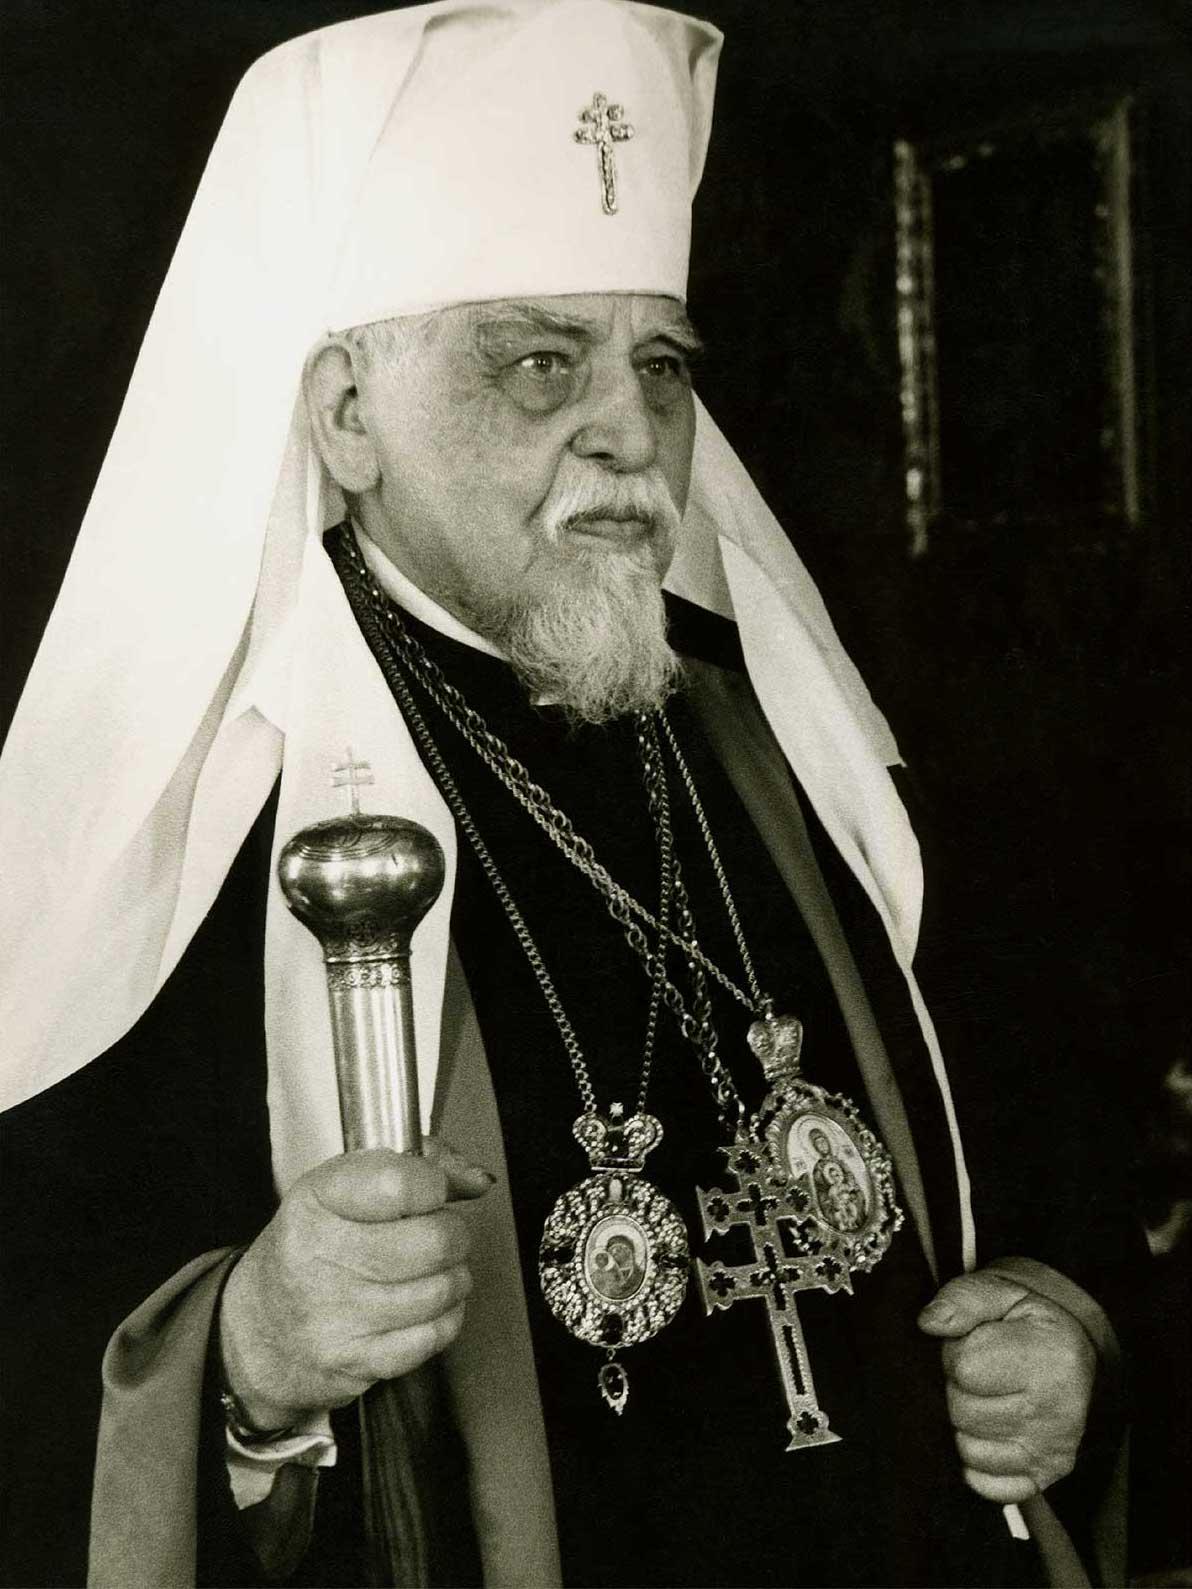 Eastern Rite Catholic Filipinos His Beatitude Cardinal